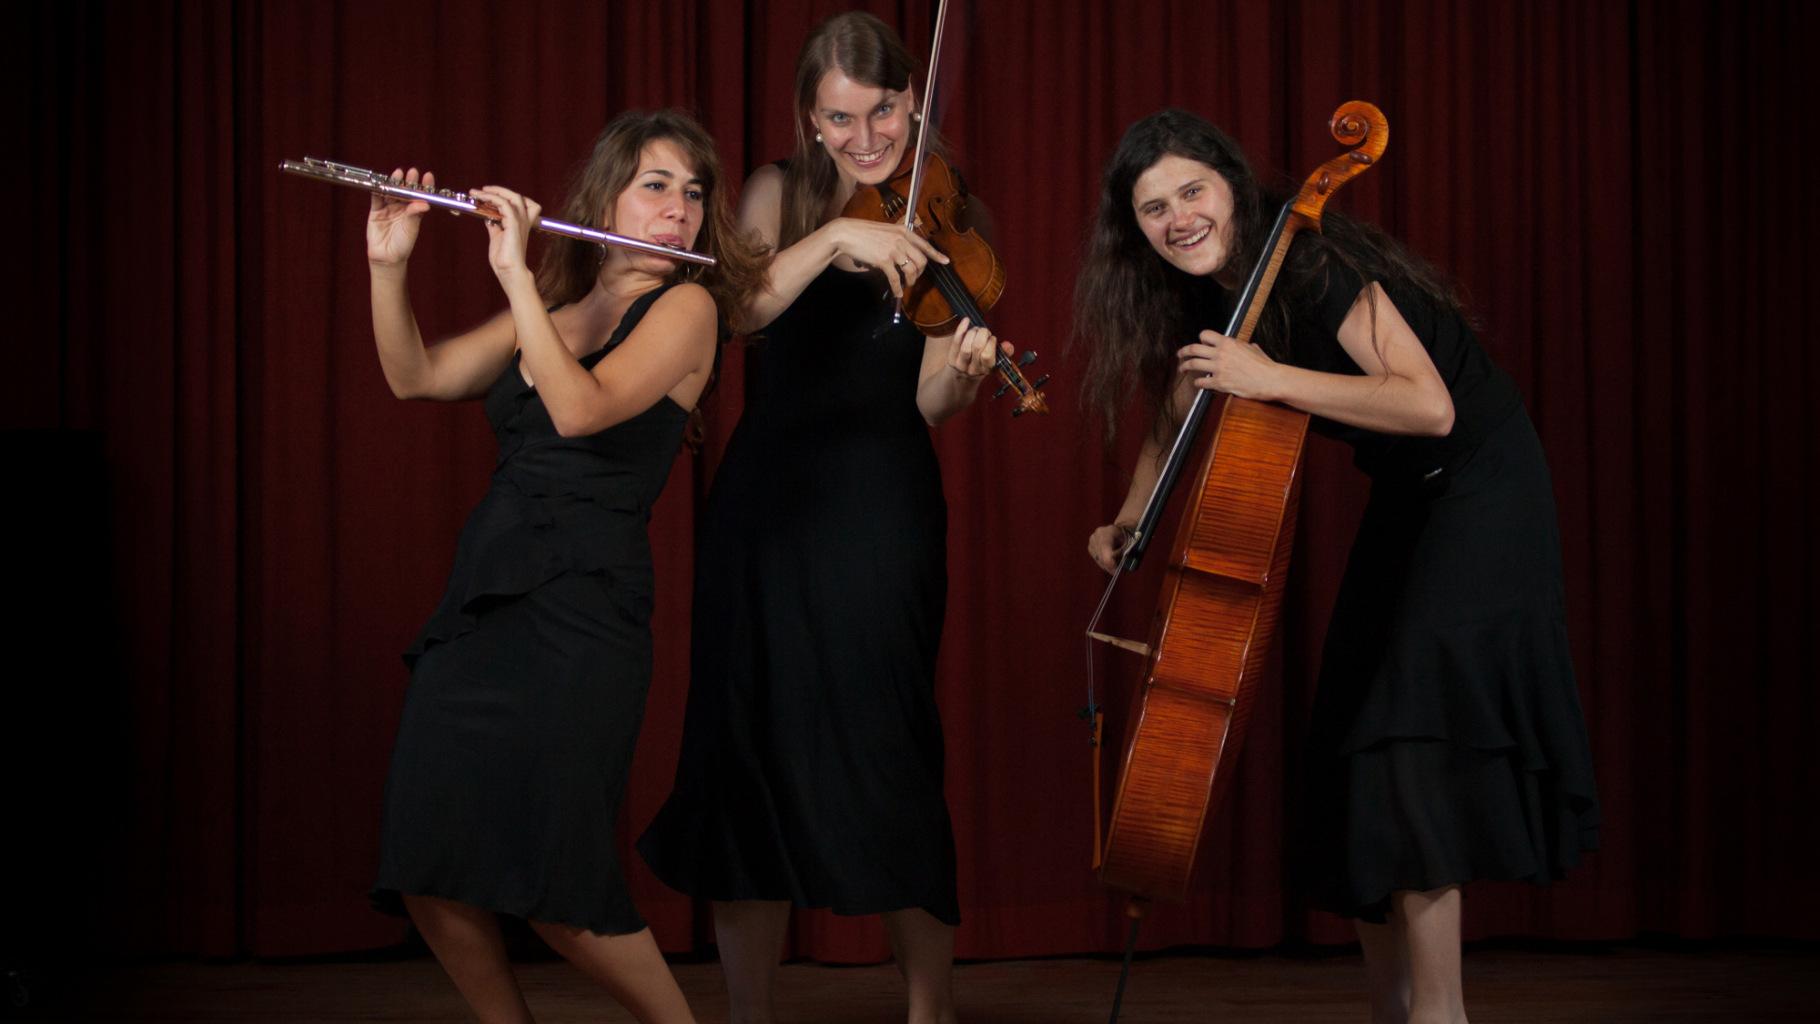 Das Trio InCanto: Leliko Gokieli, Johanna Bastian und Emilia Lomakova (v.l.)